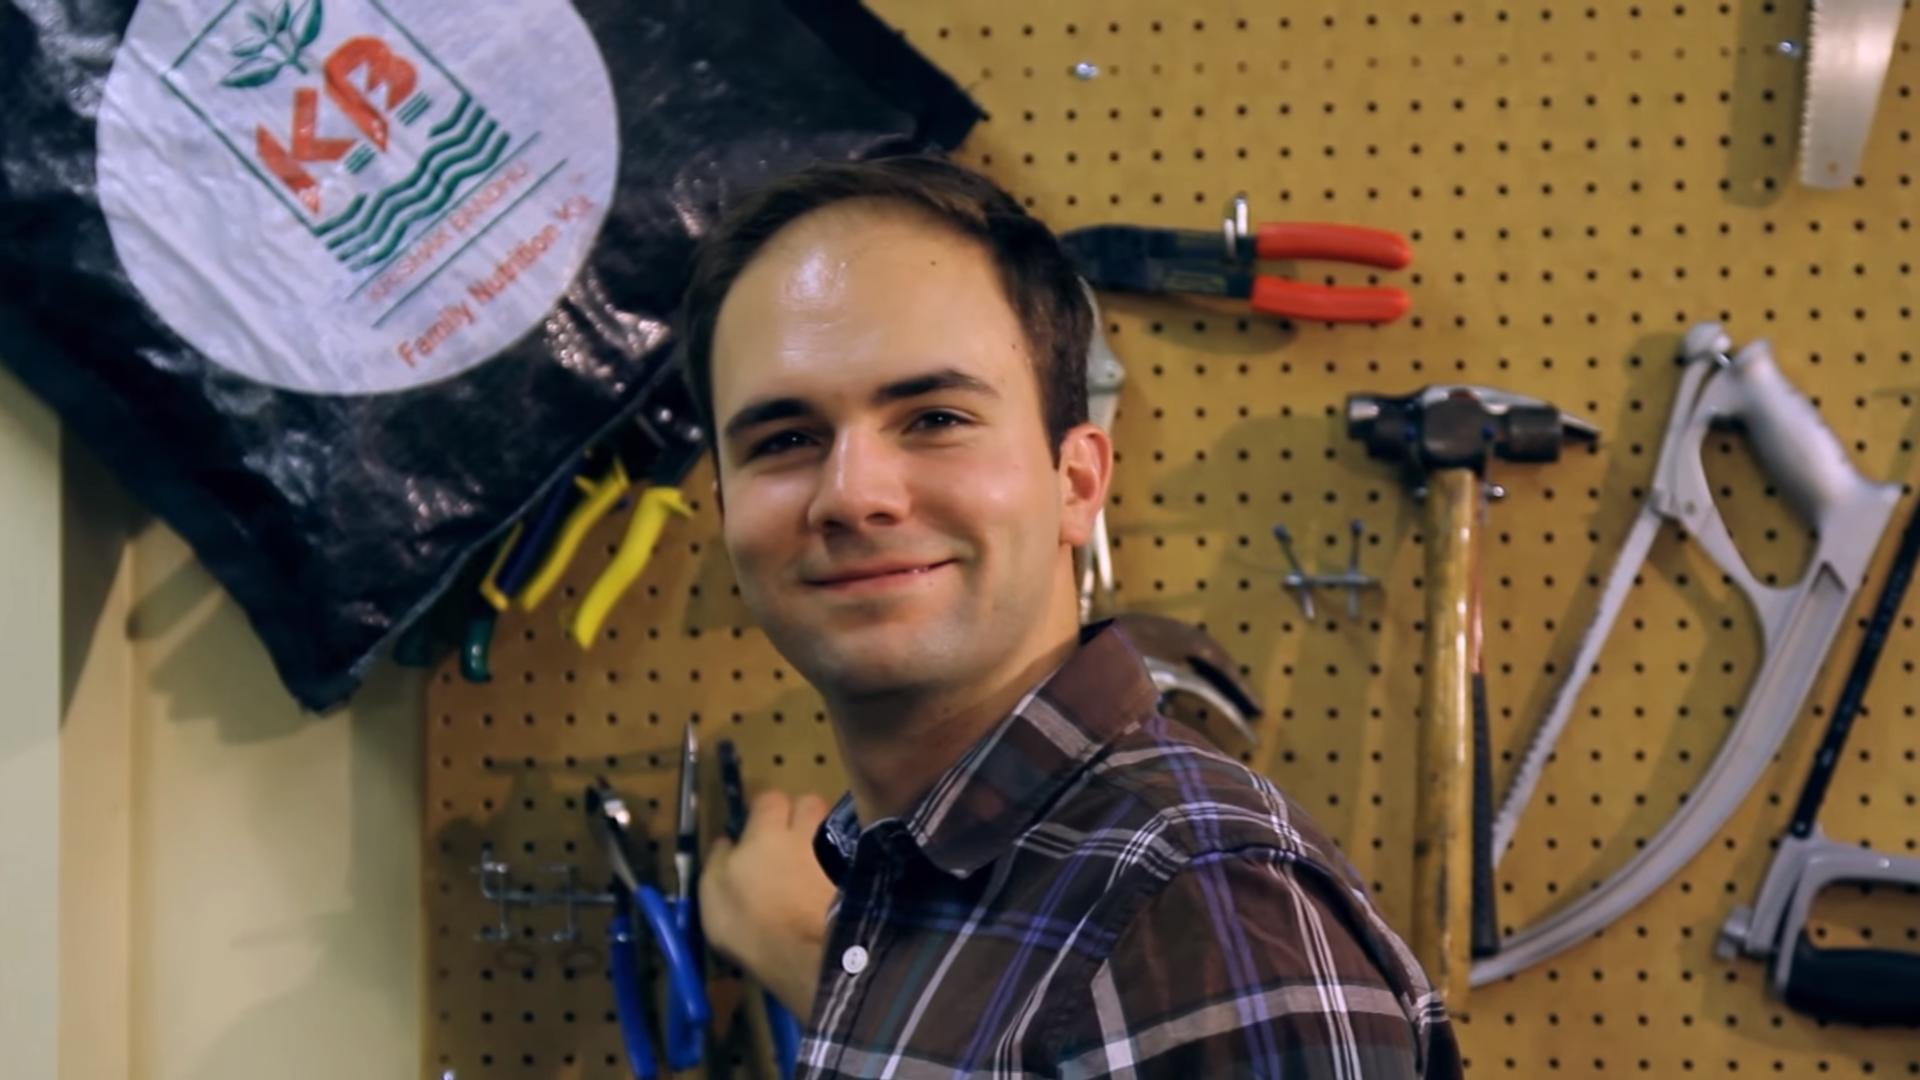 Edward Silva, Co-Founder